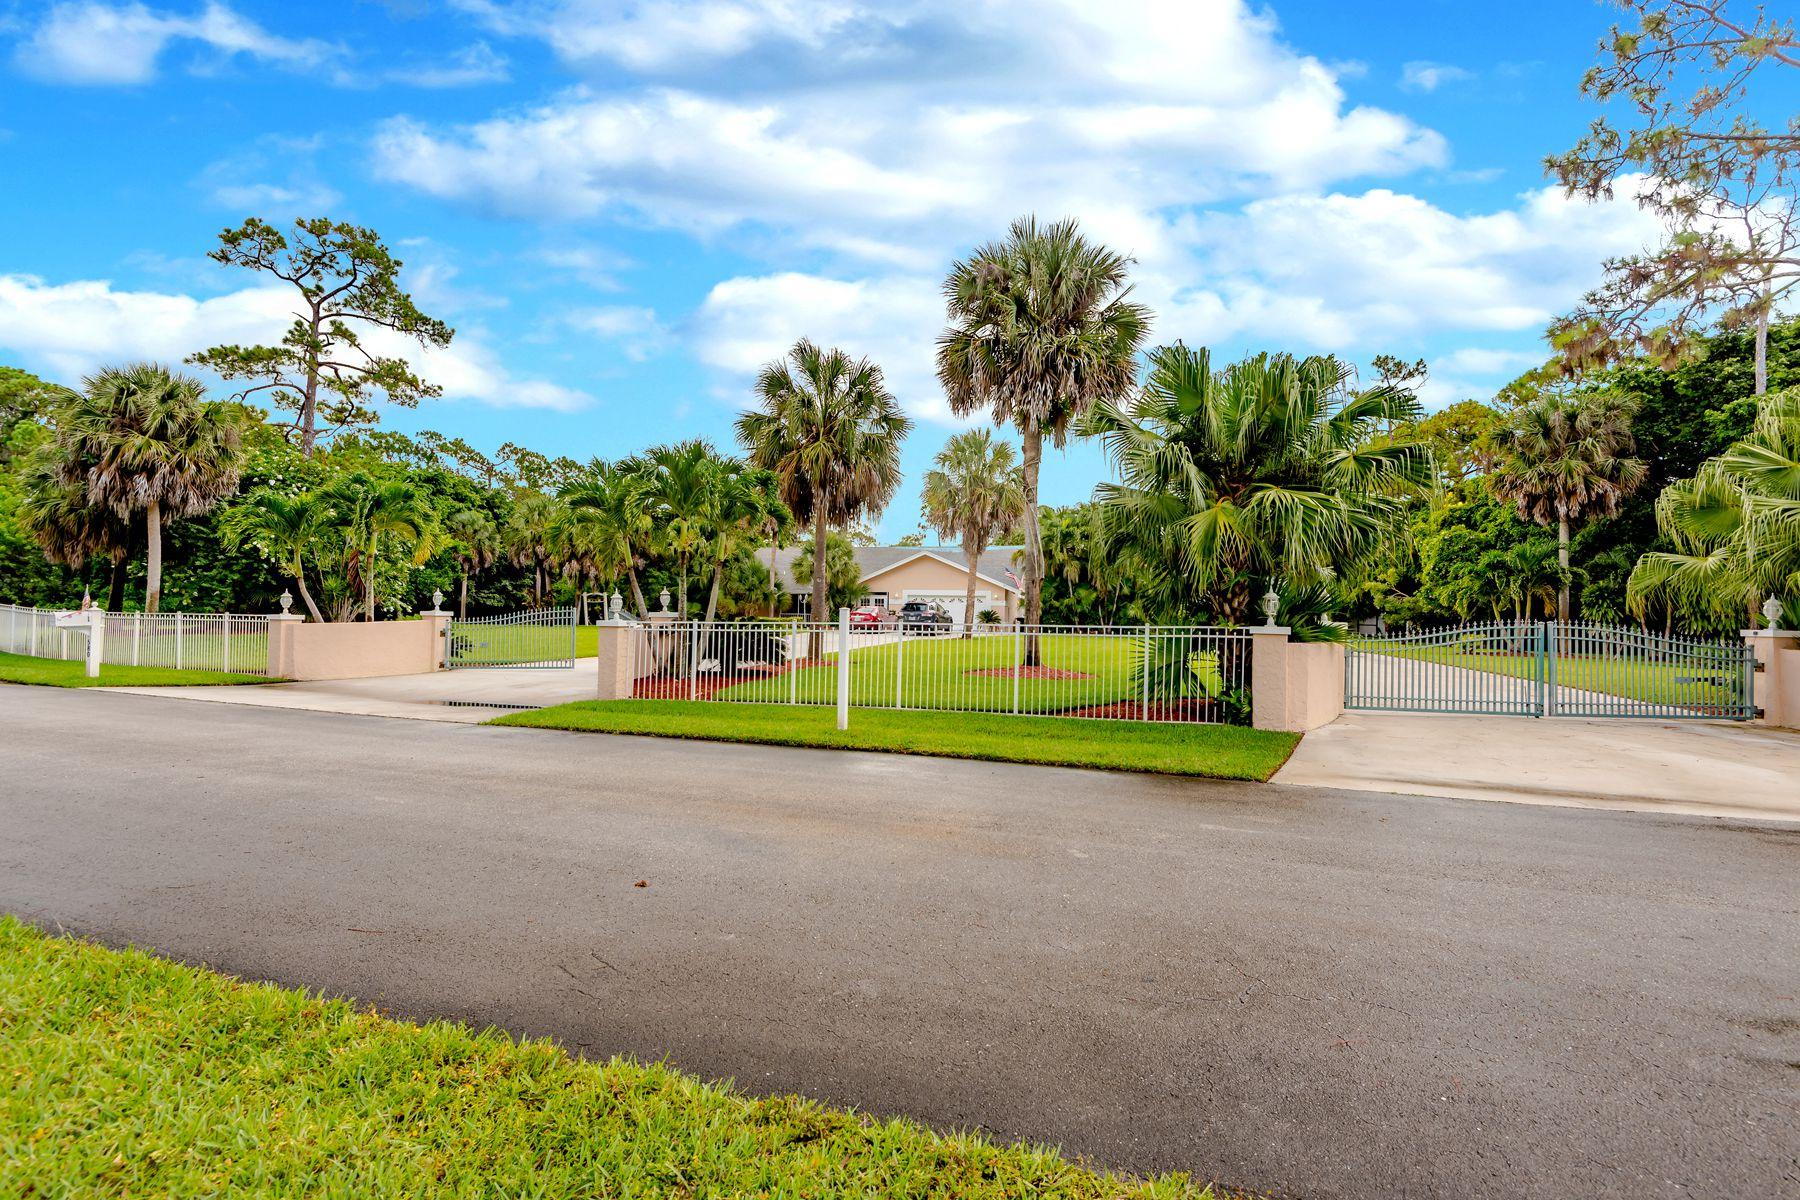 580 Pine Hollow Ln For Sale - West Palm Beach, FL | Trulia